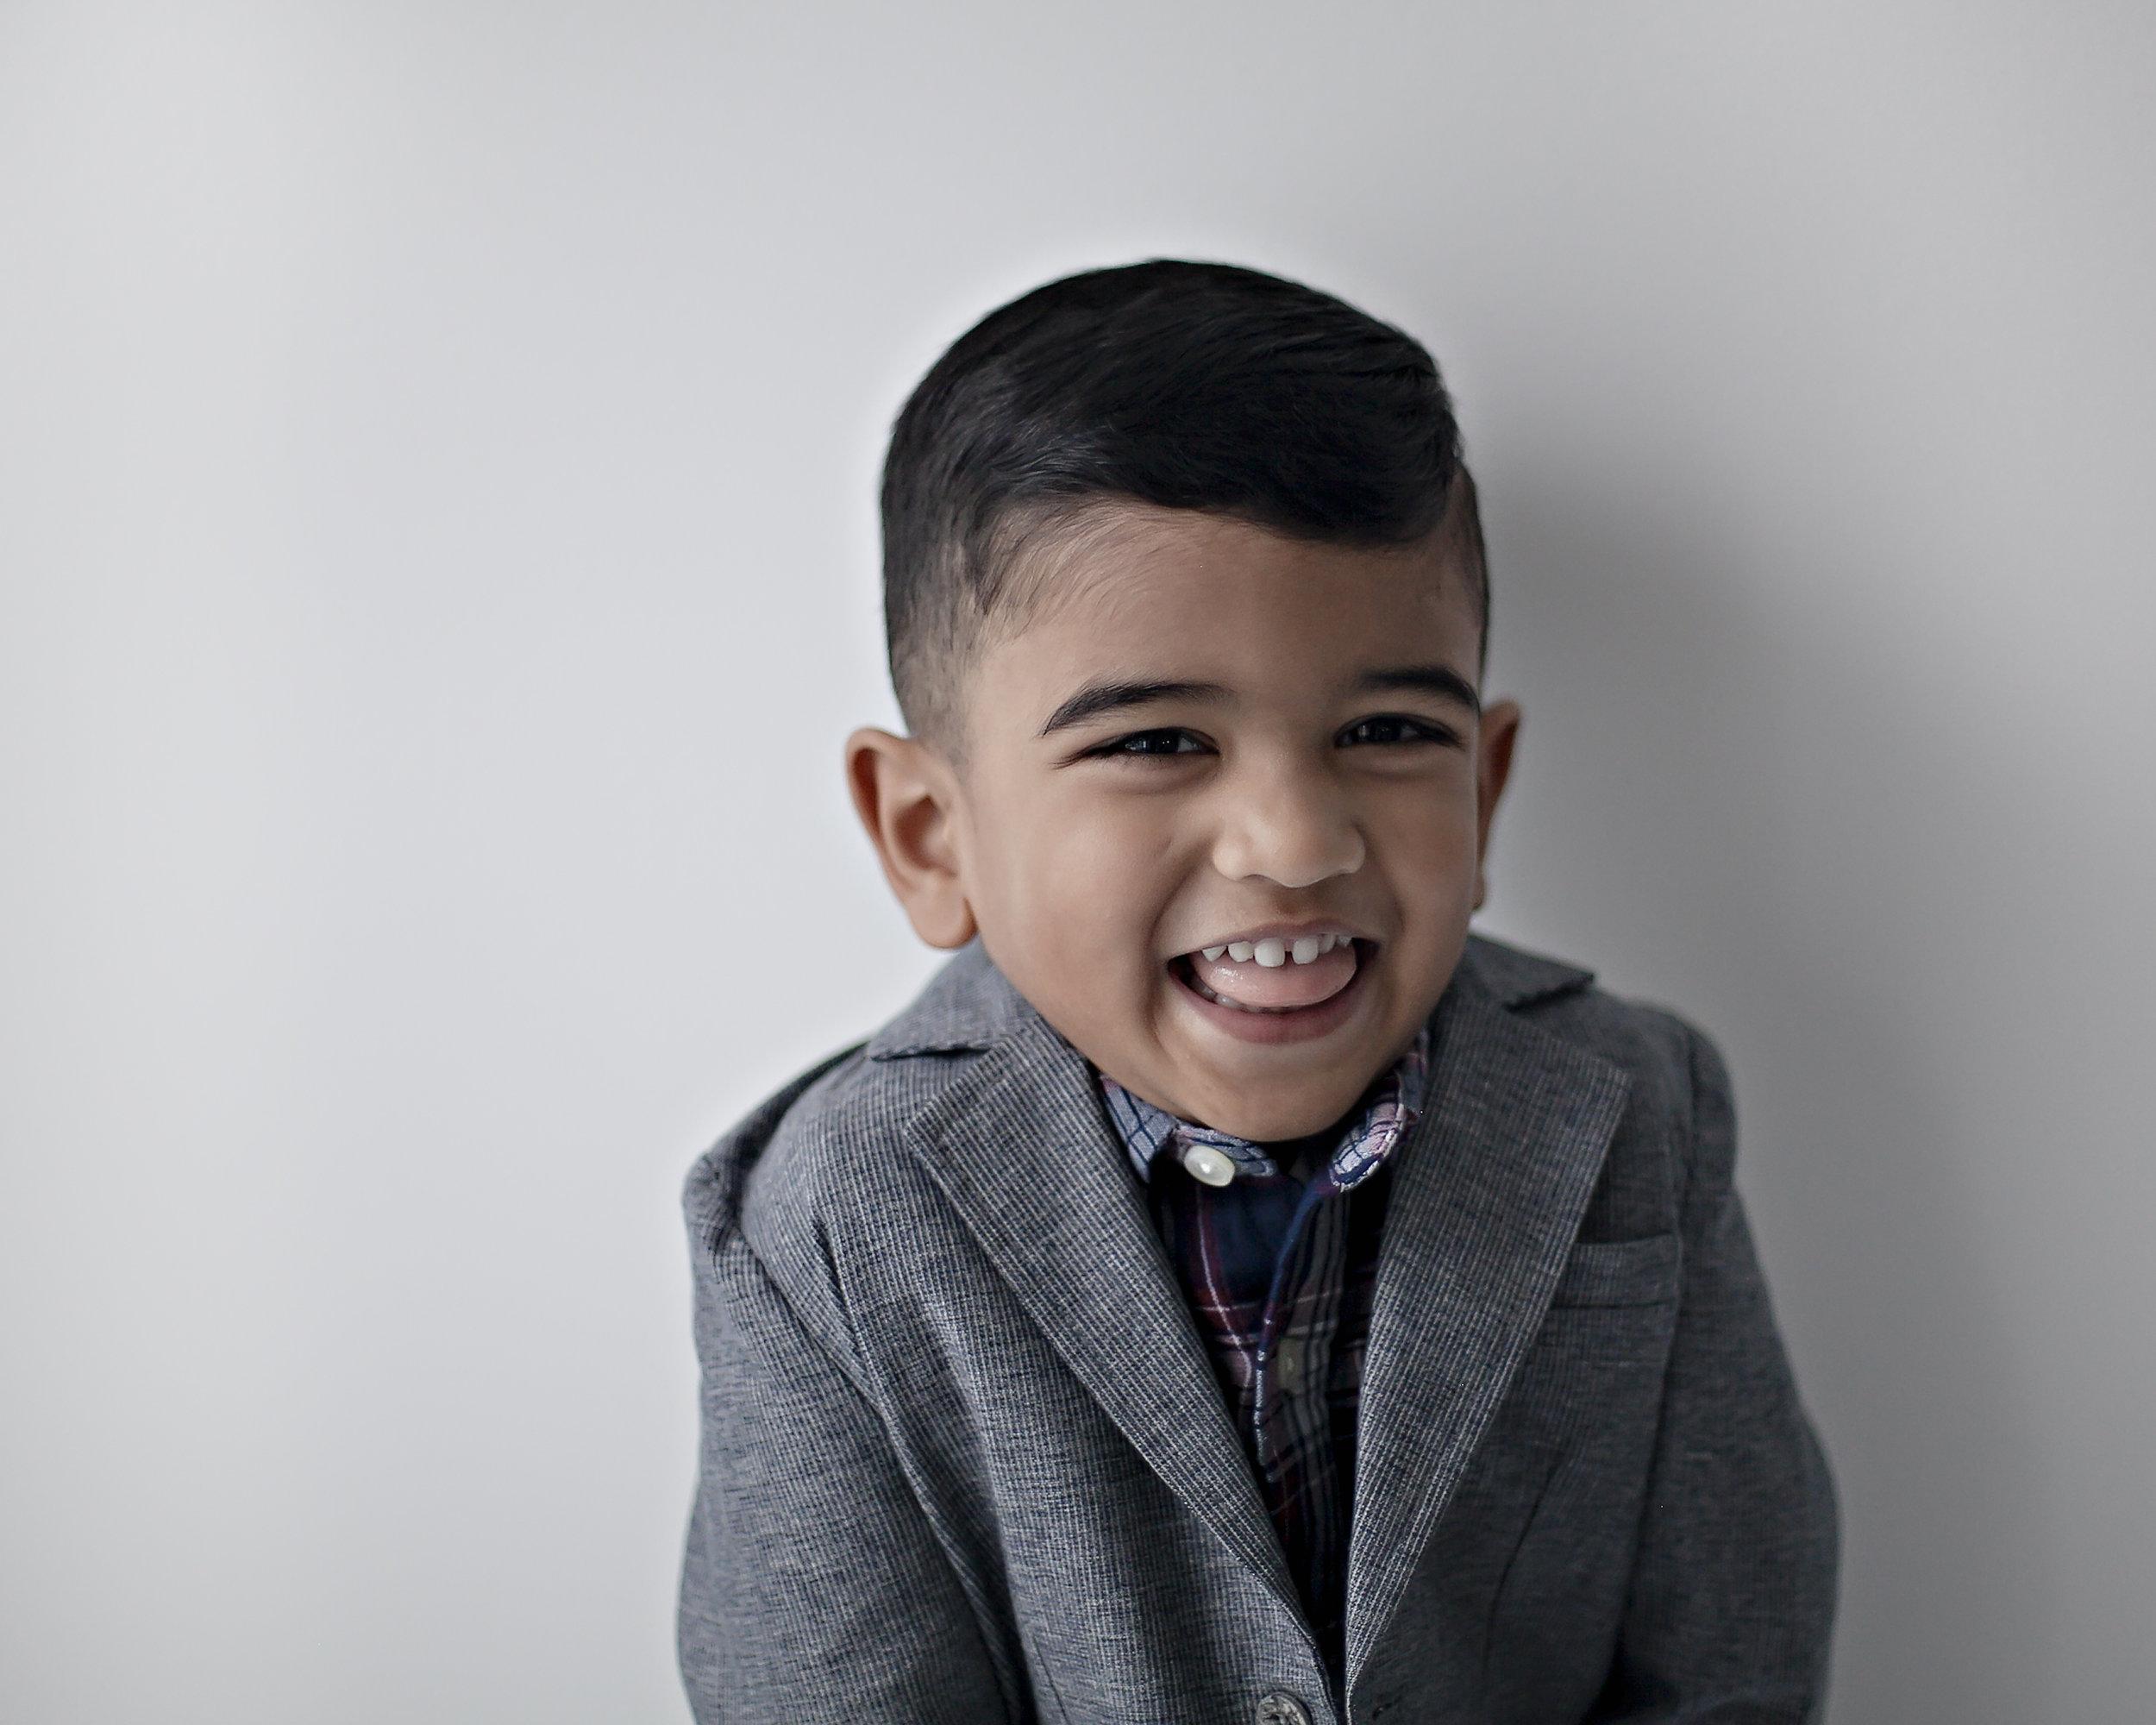 Petra_King_Photography_Child_Portrait_Photography